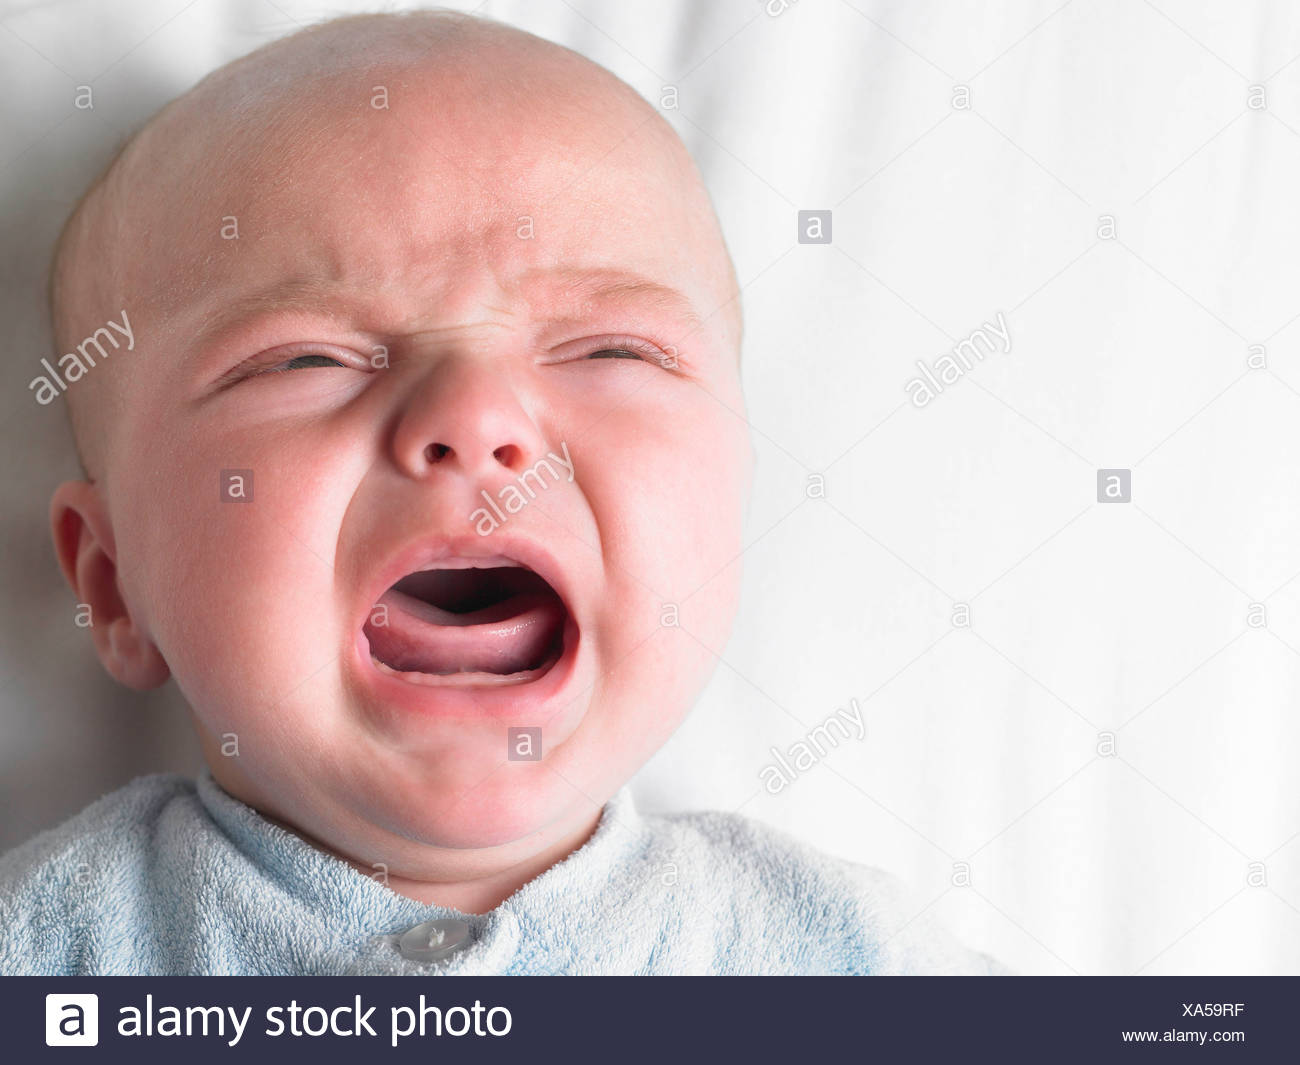 Baby-boy crying - Stock Image